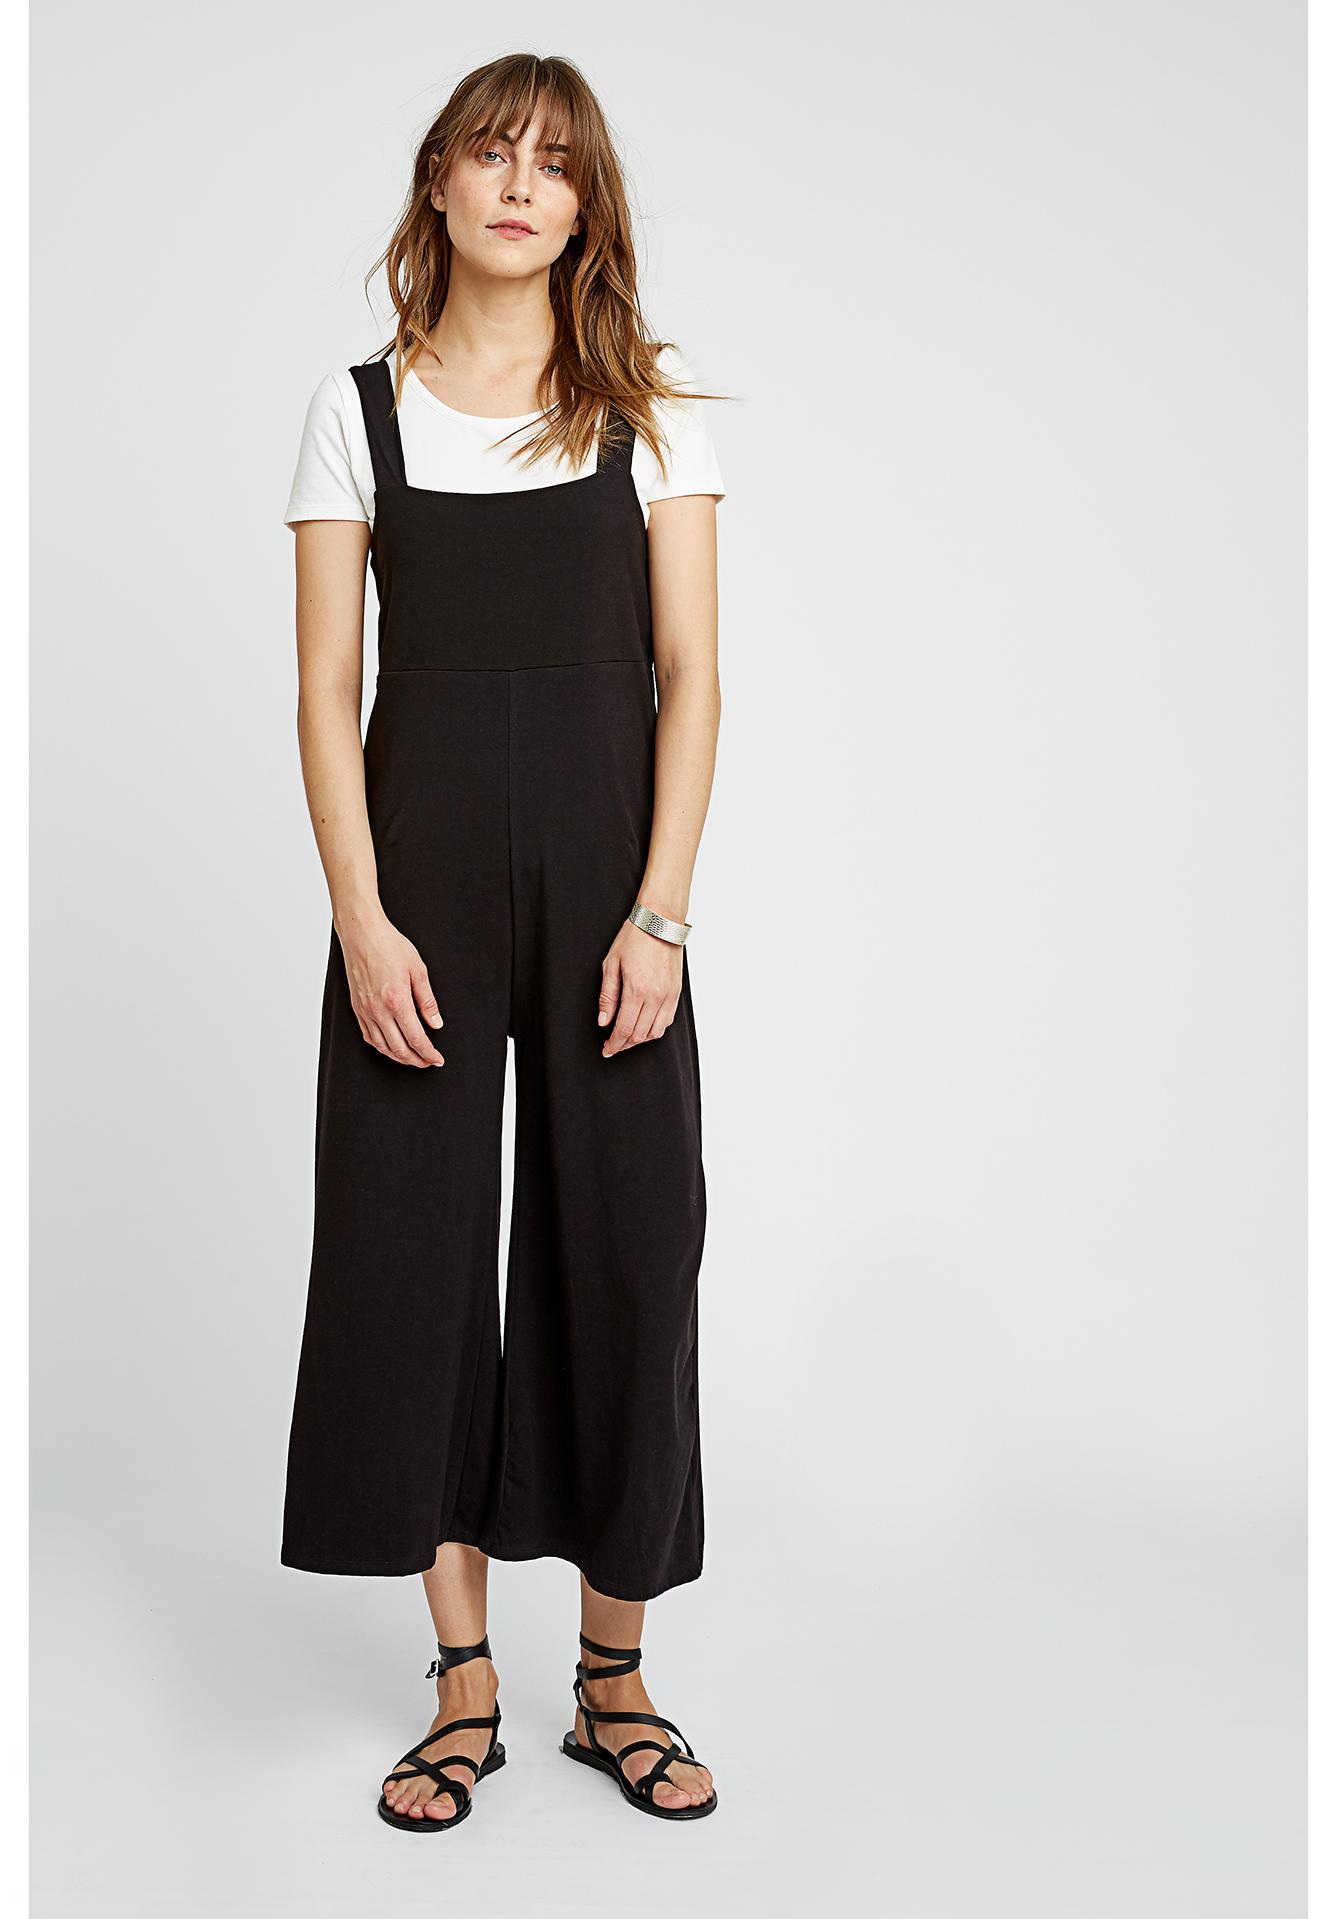 diana-black-jumpsuit-dd387dcc0075.jpg